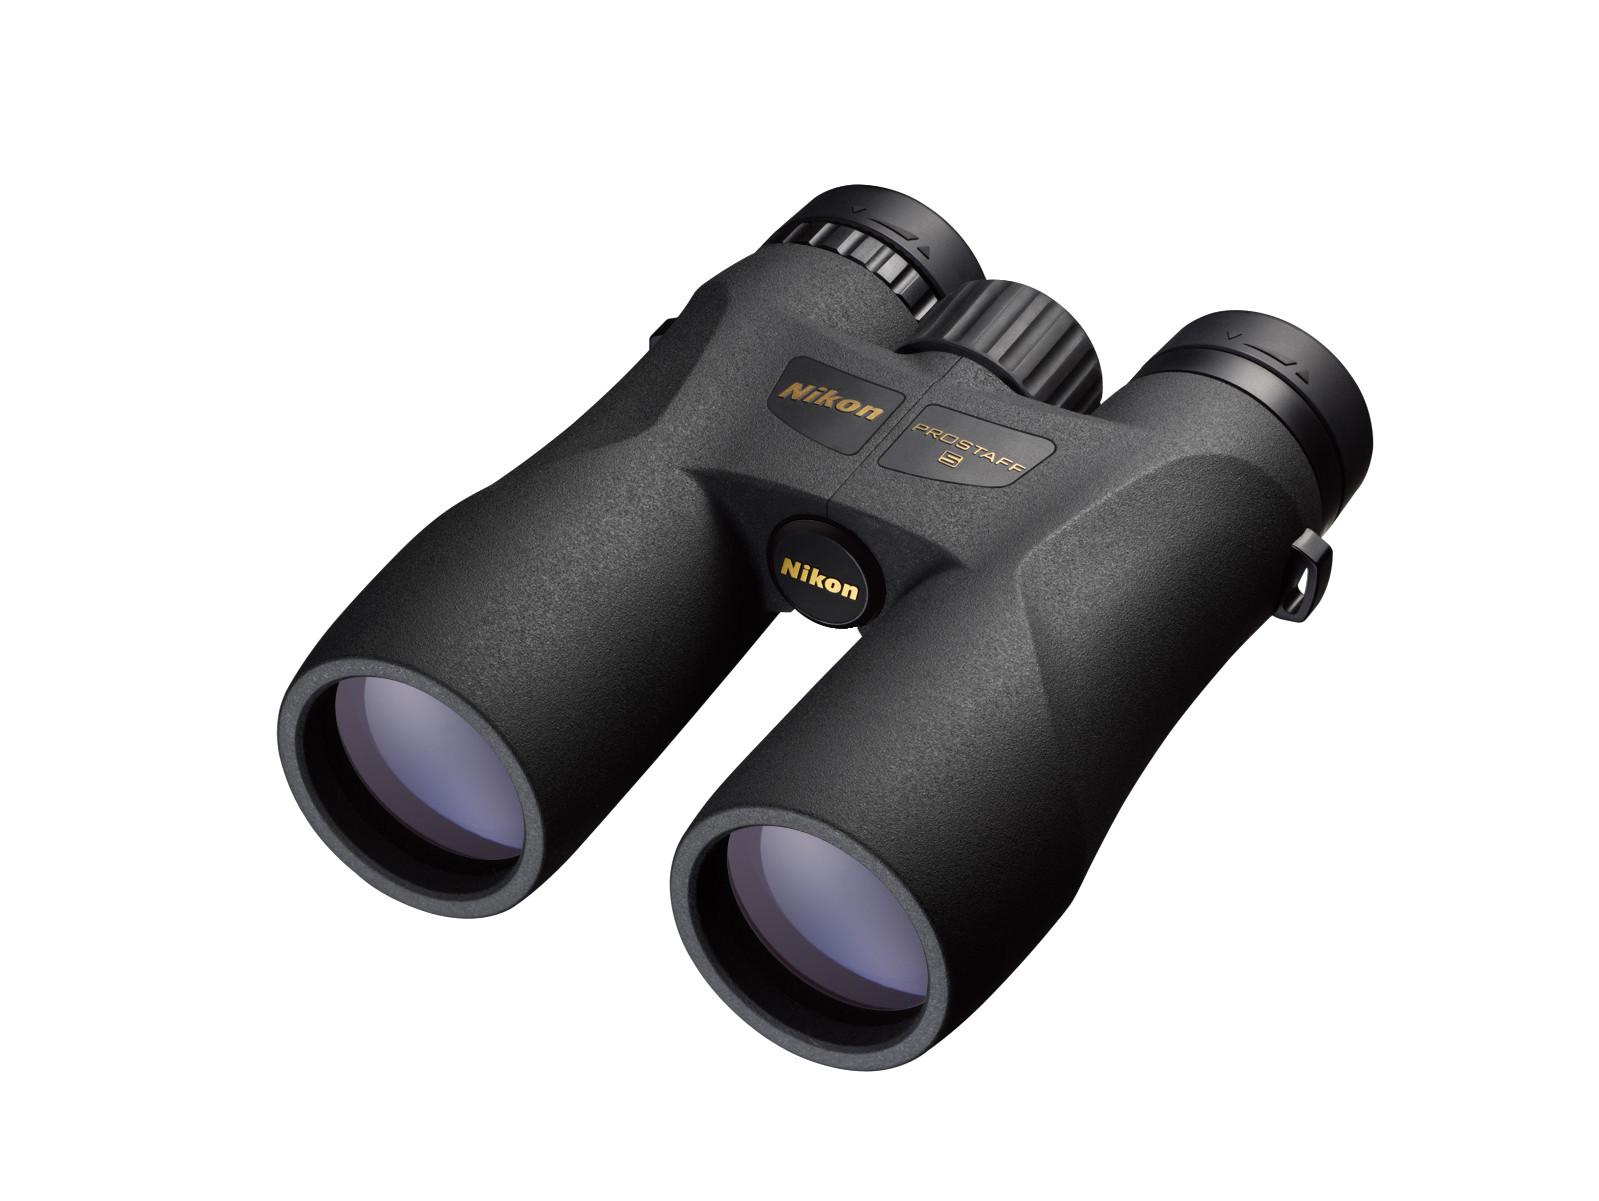 Prostaff 5 10X42 雙筒望遠鏡